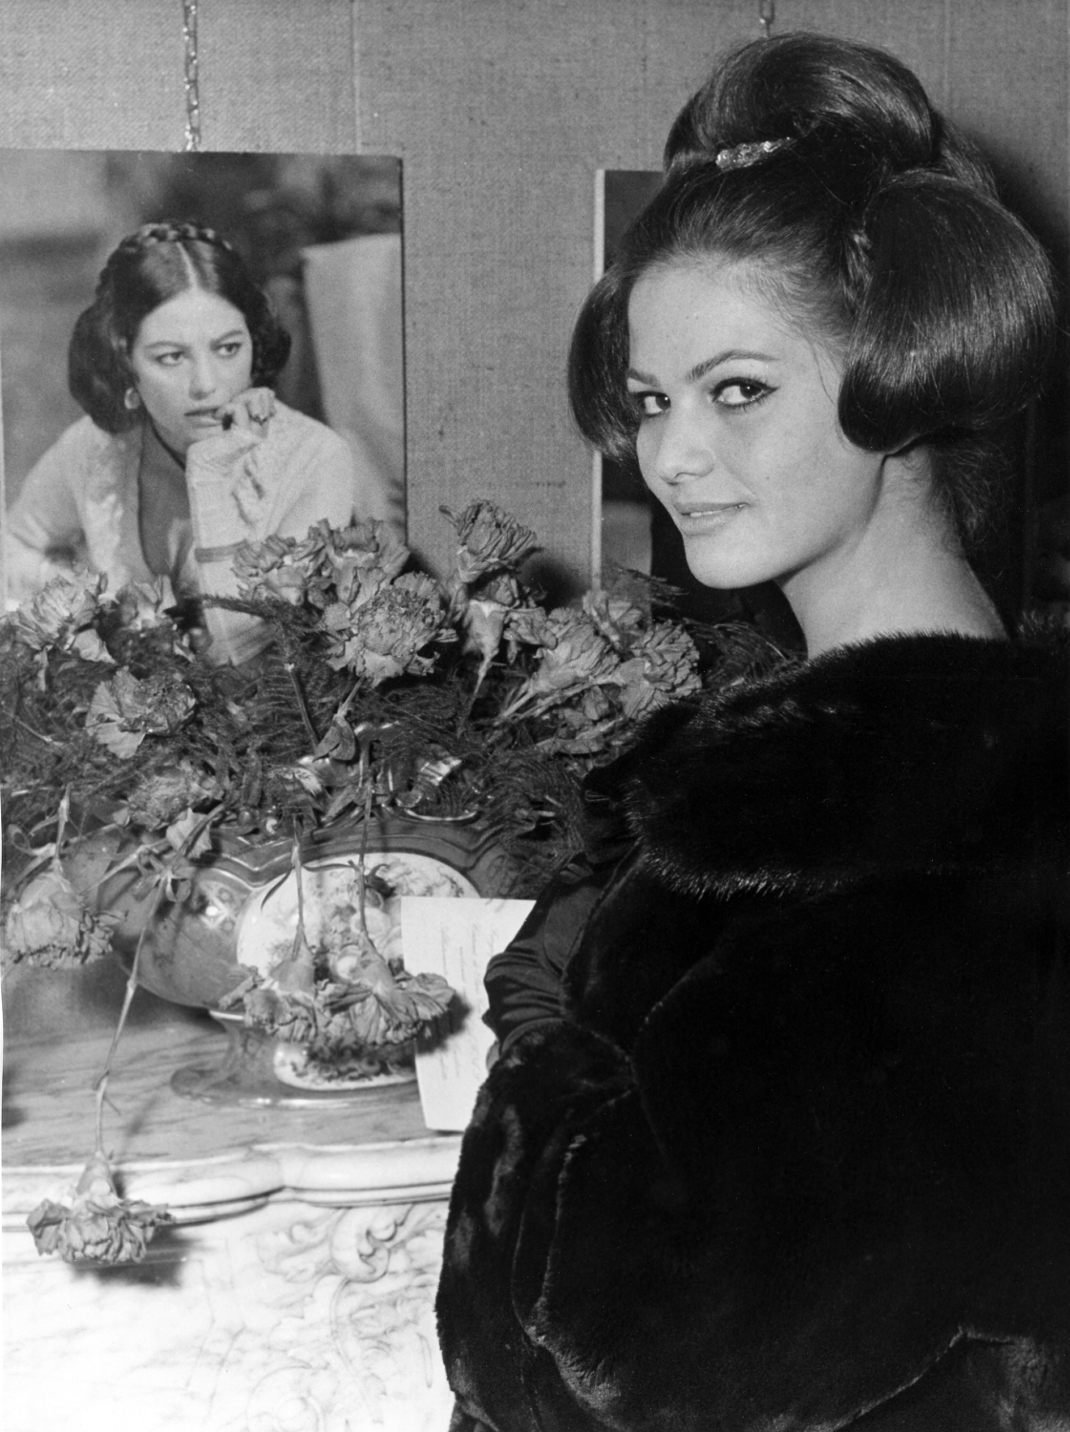 H Κλαούντια Καρντινάλε στα γυρίσματα της ταινίας «The Leopard», 1963/ Φωτογραφία: AP Images